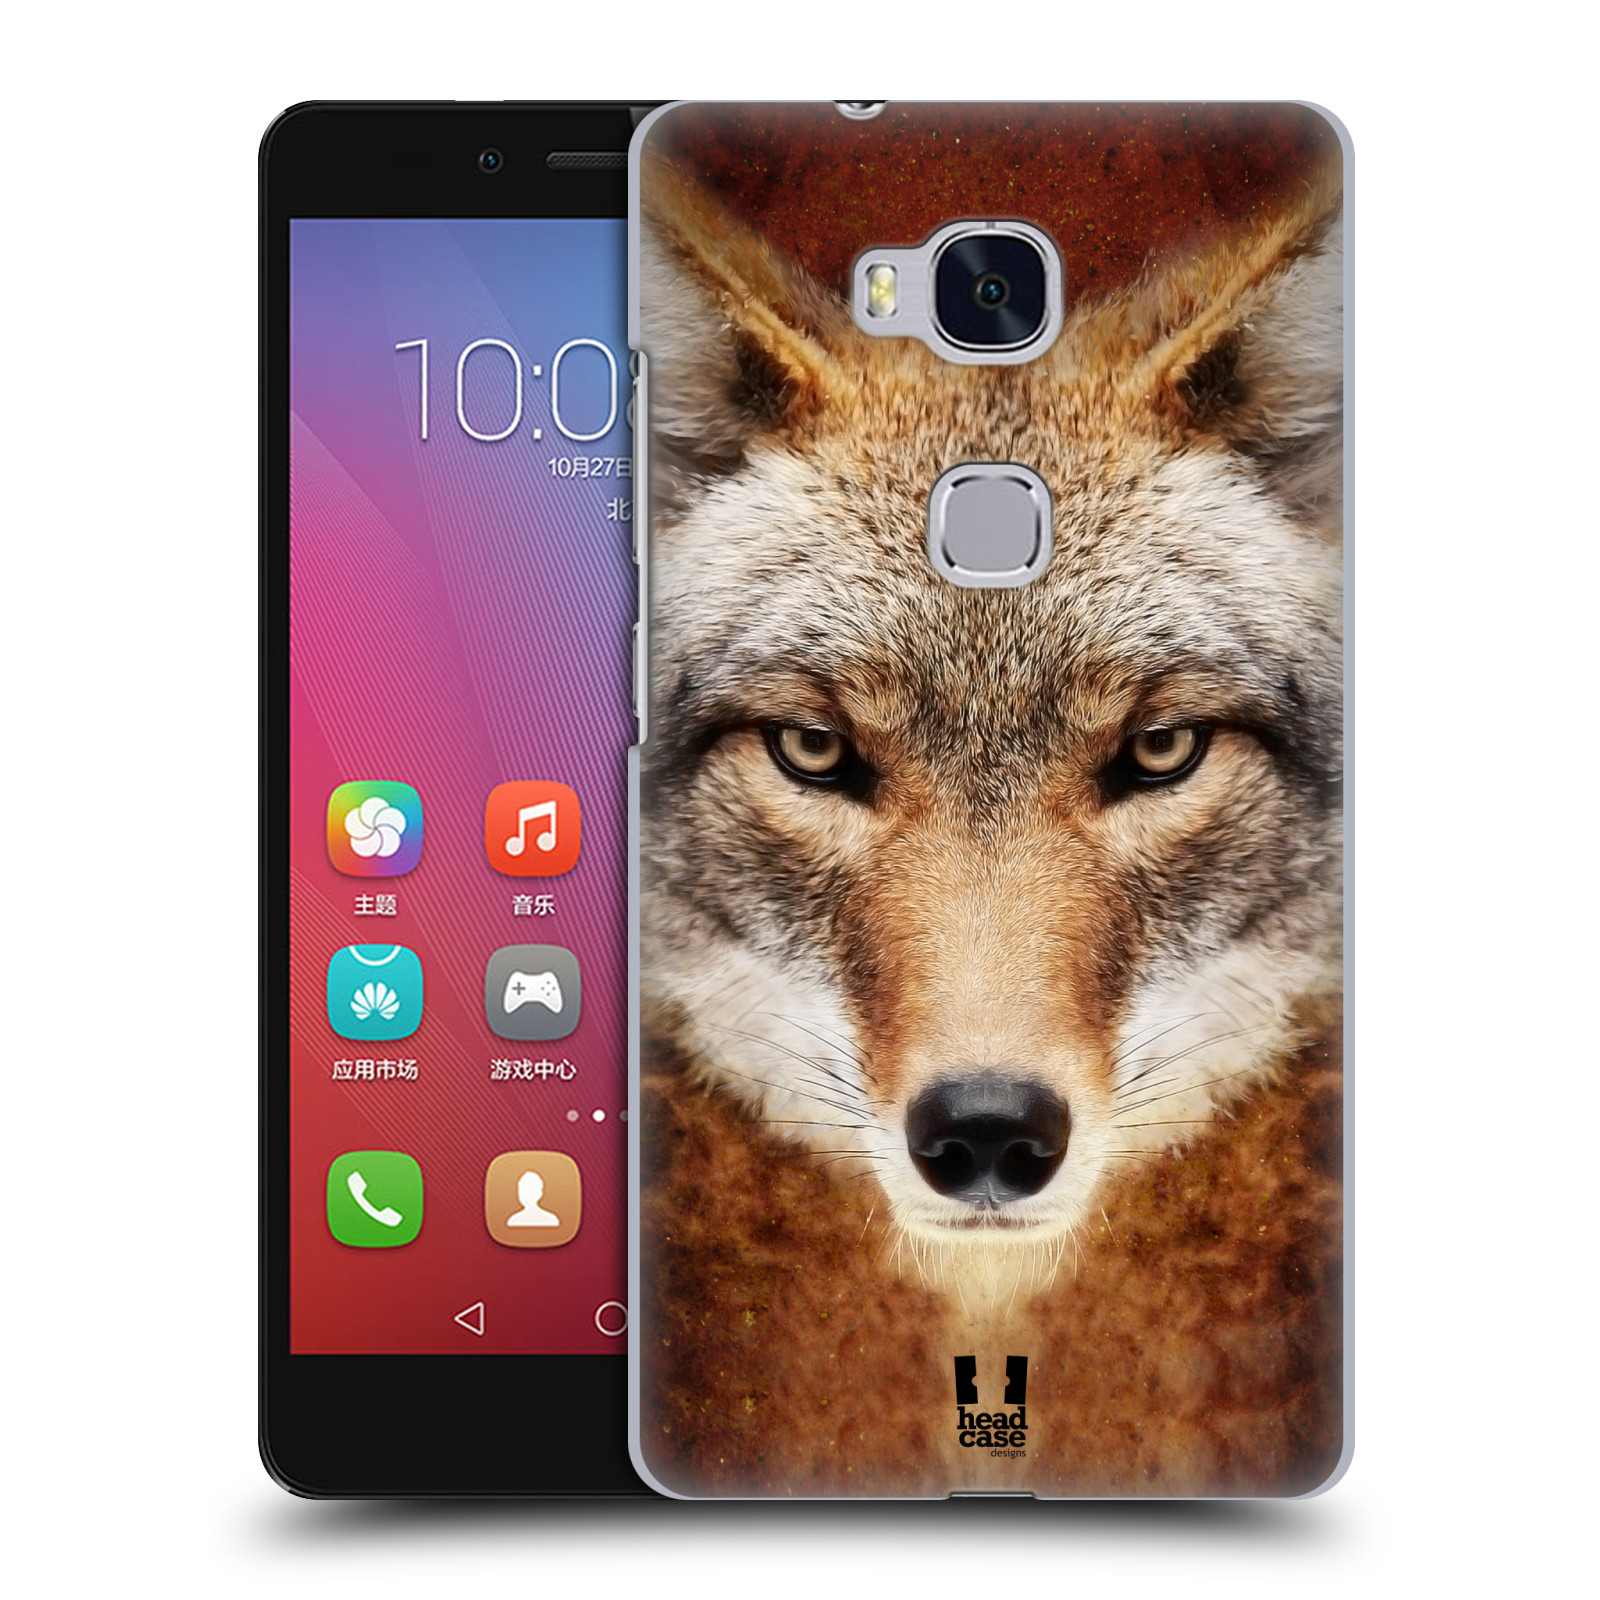 HEAD CASE pevný plastový obal na mobil HUAWEI HONOR 5X vzor Zvířecí tváře kojot